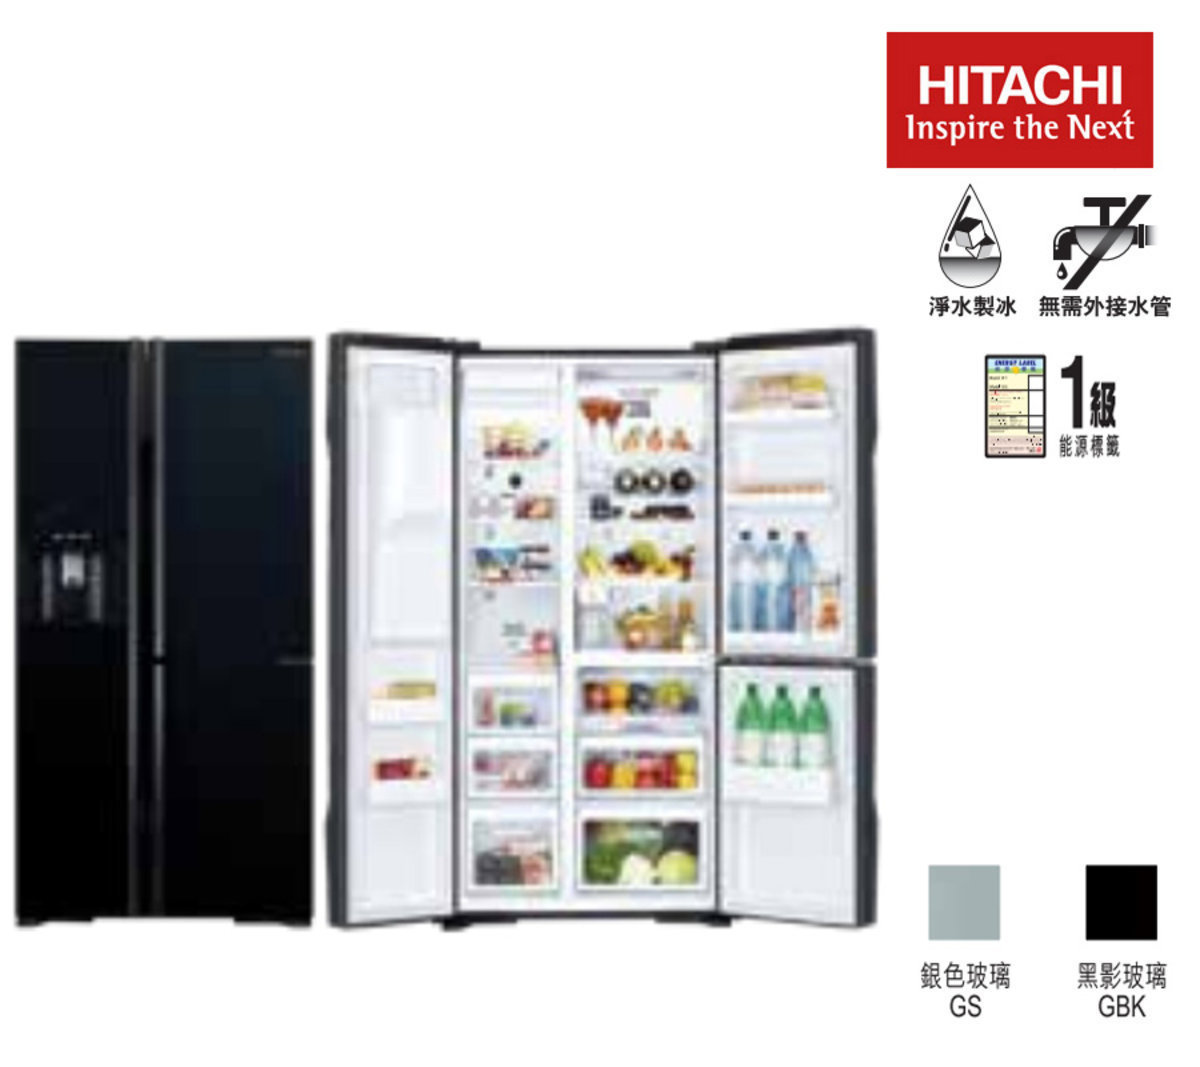 Side-by-side Refrigerator 569L (Glass Black) R-M700GP2HGBK